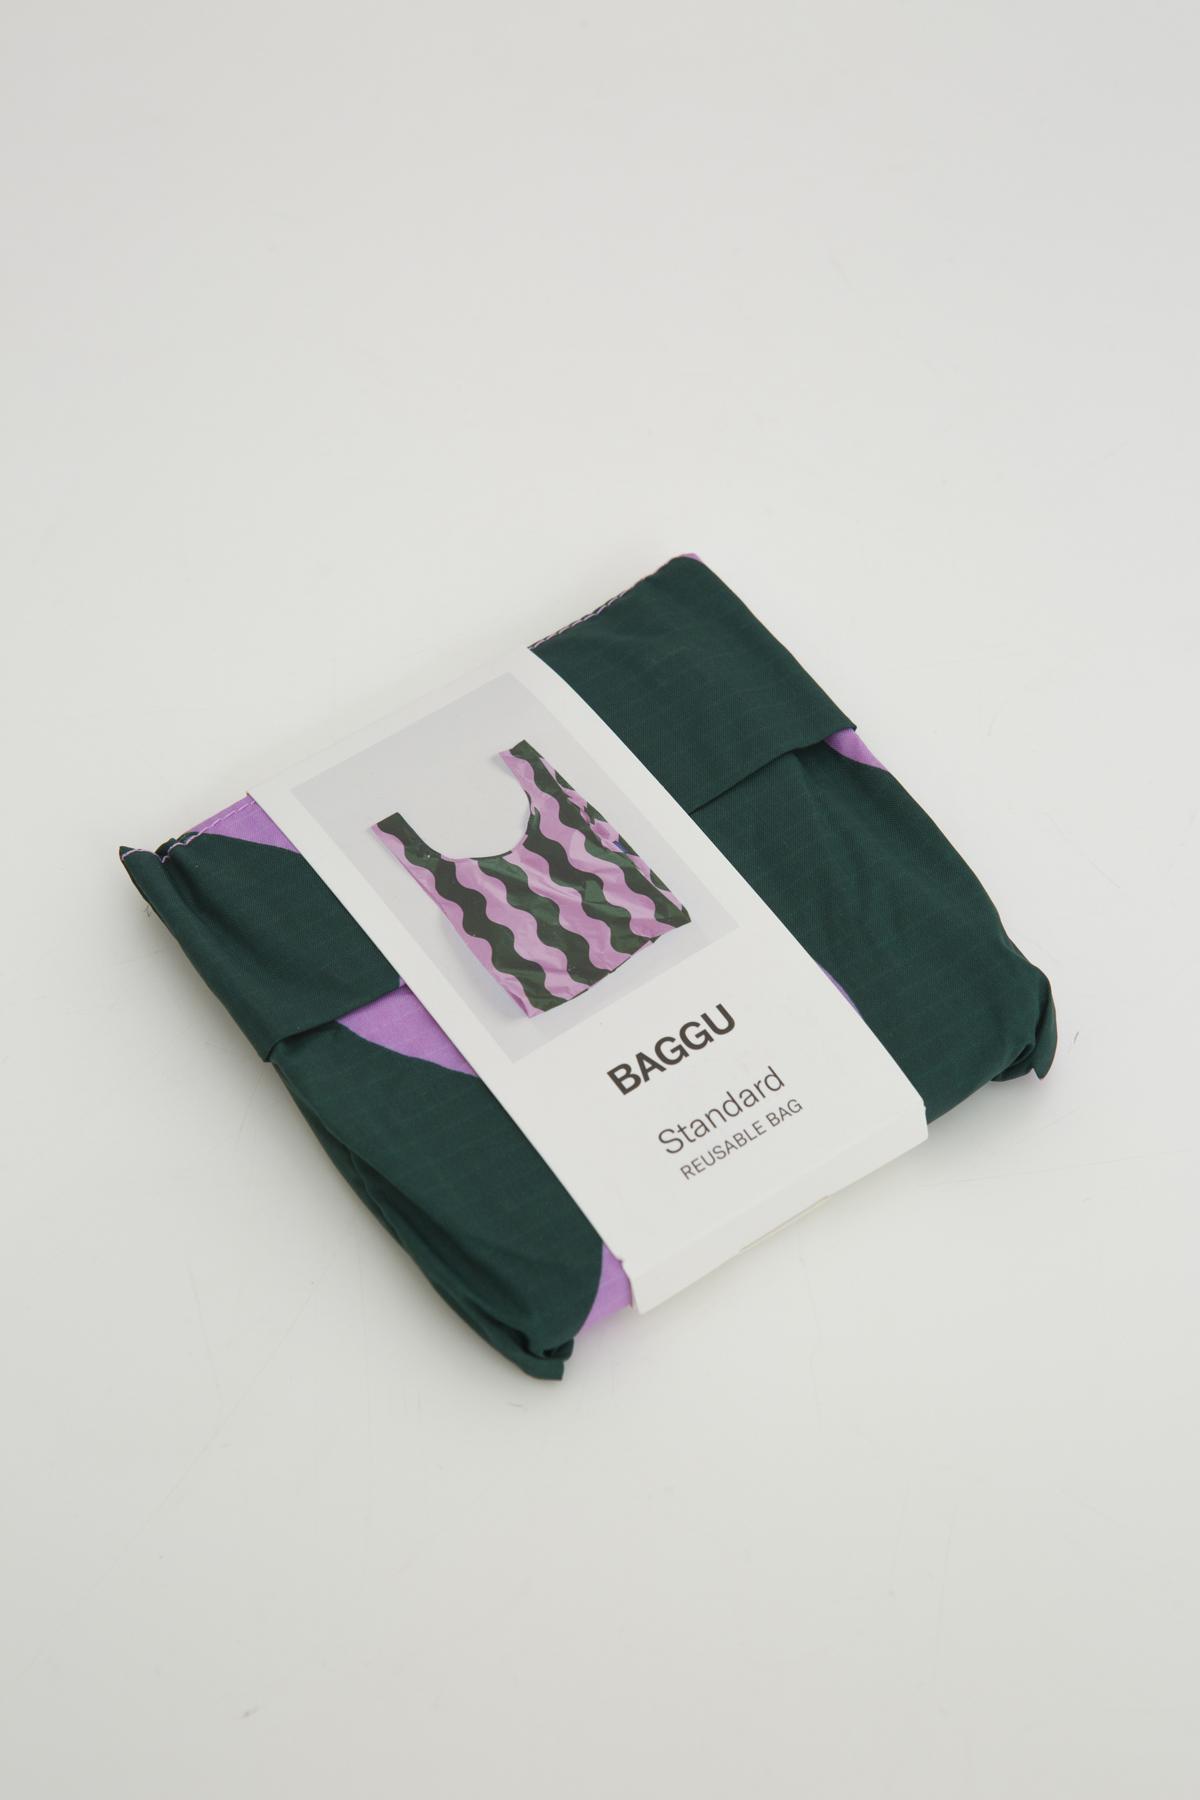 standard-bag-pink-green-wavy-stripe-shopping-nylon-eco-friendly-baggu-matchboxathens